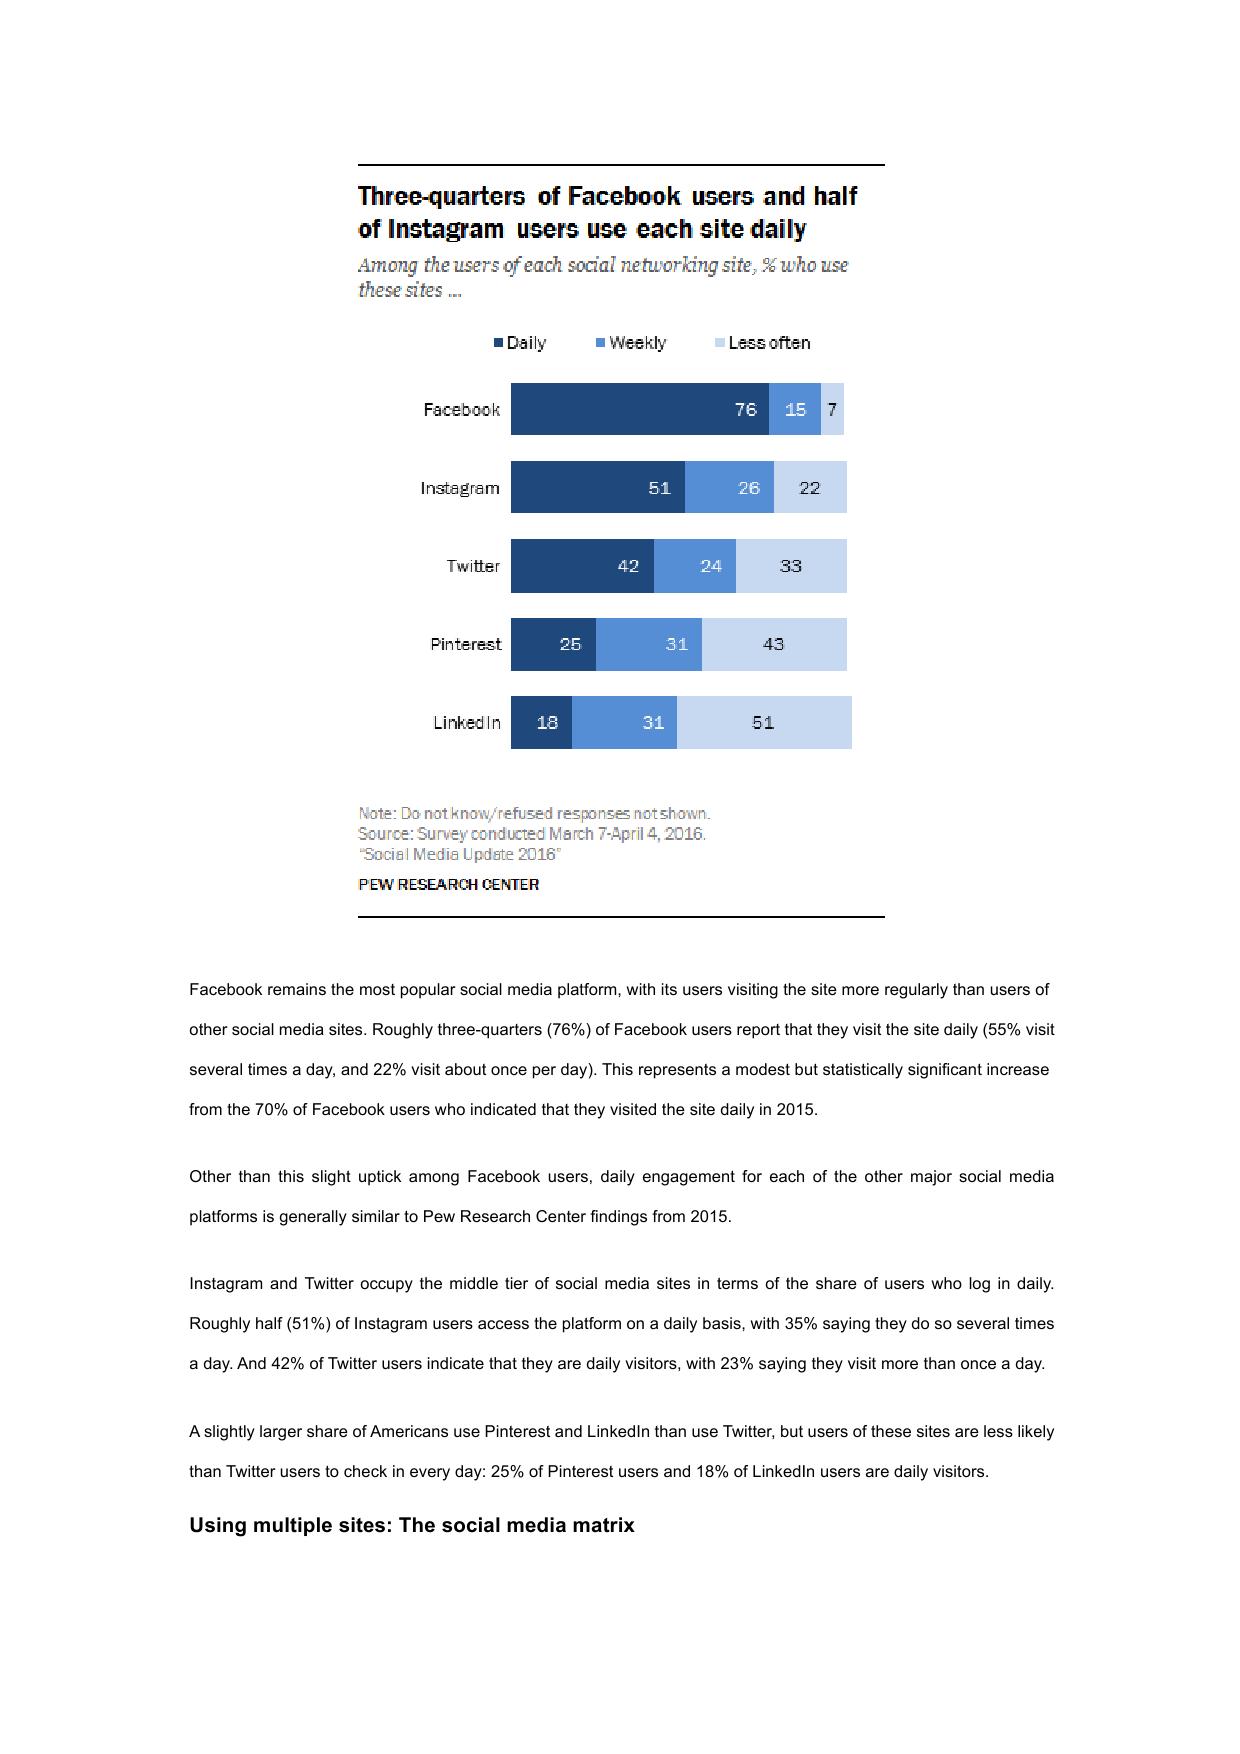 2016%e7%a4%be%e4%ba%a4%e5%aa%92%e4%bd%93%e7%9a%84%e4%bd%bf%e7%94%a8%e7%8a%b6%e5%86%b5_000008